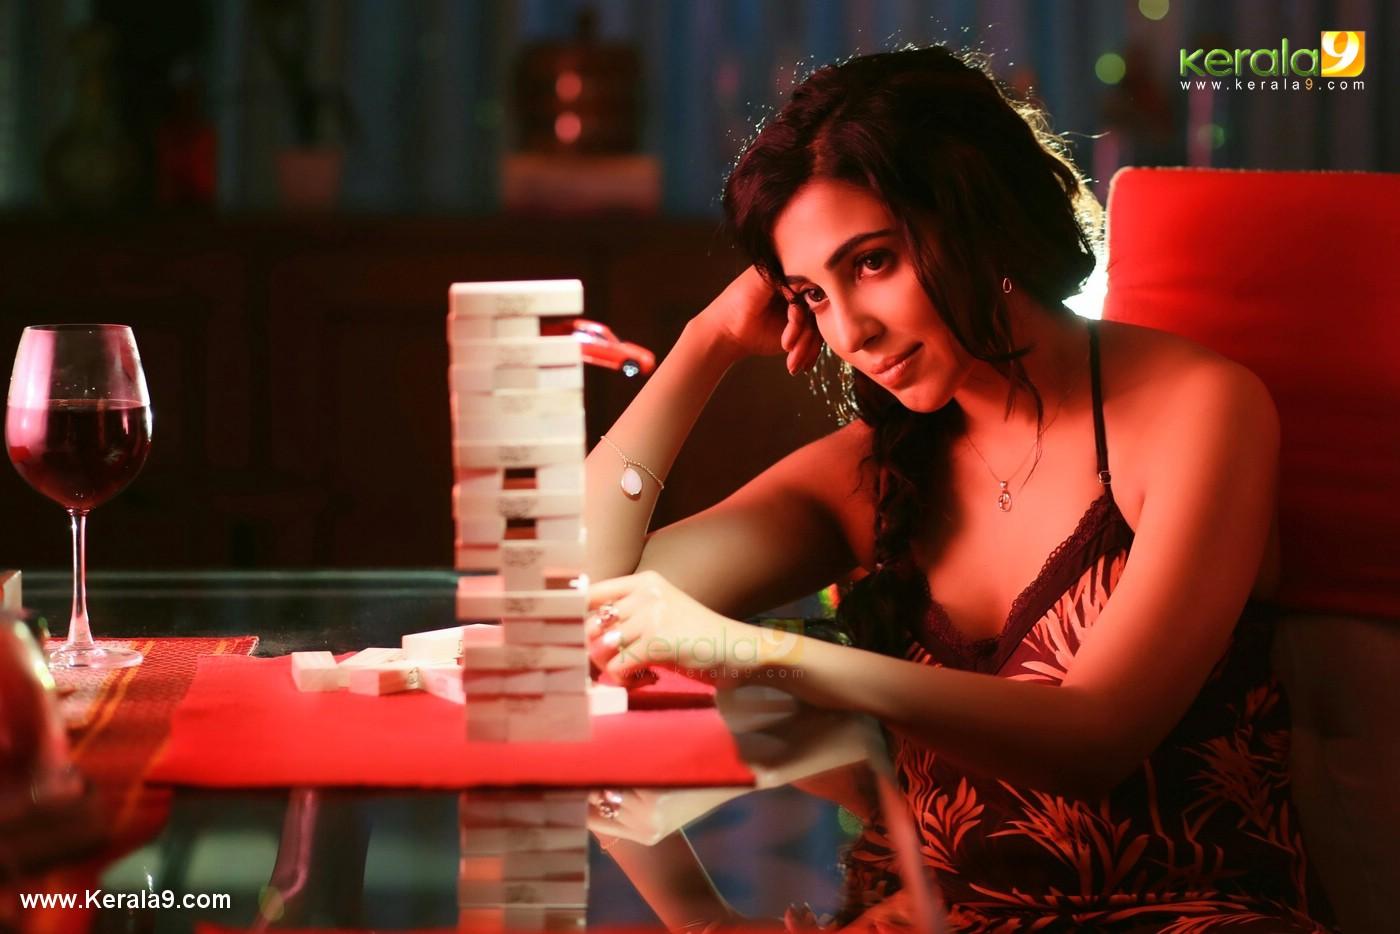 neerali malayalam movie images 0923 14